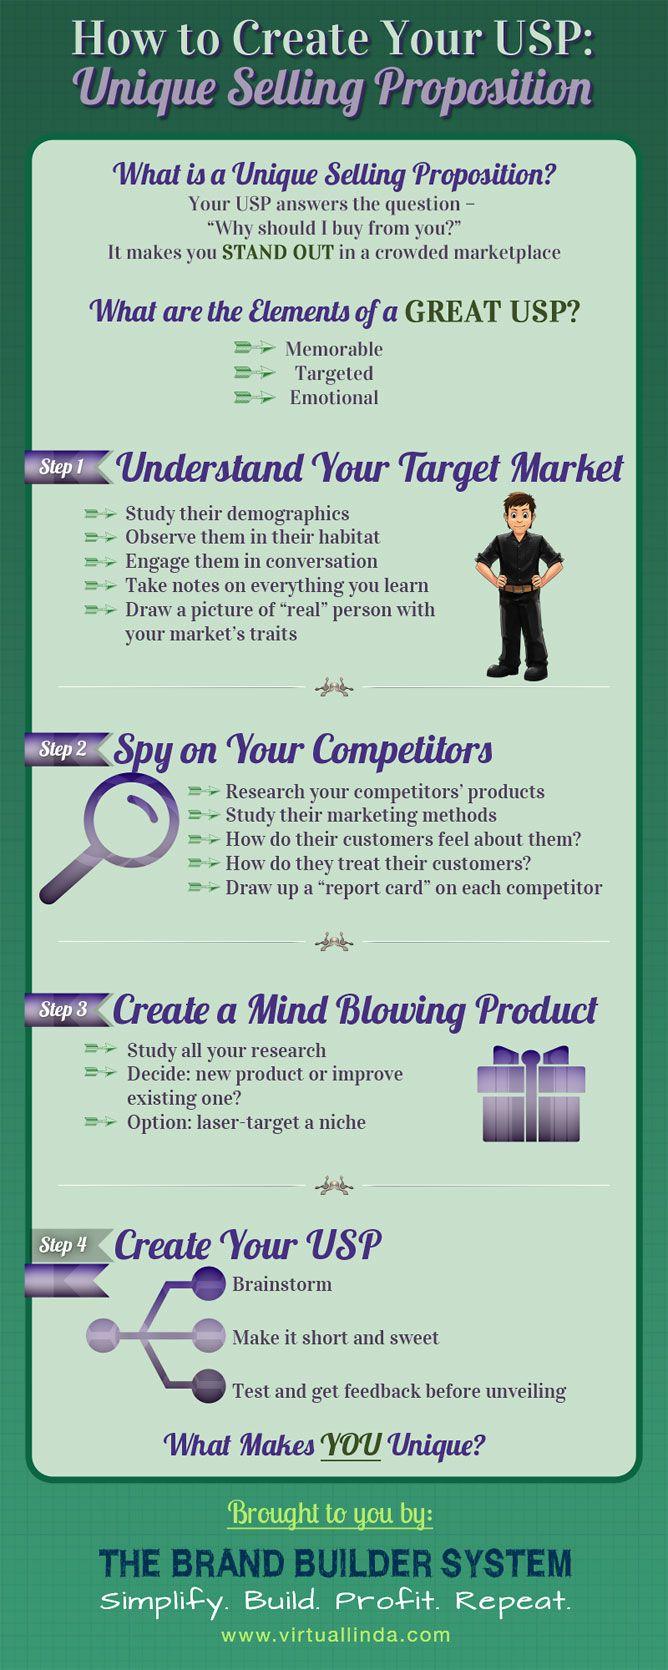 How To Create Your Usp Unique Selling Proposition Infographic Lebenslauf Bloggen Web Design